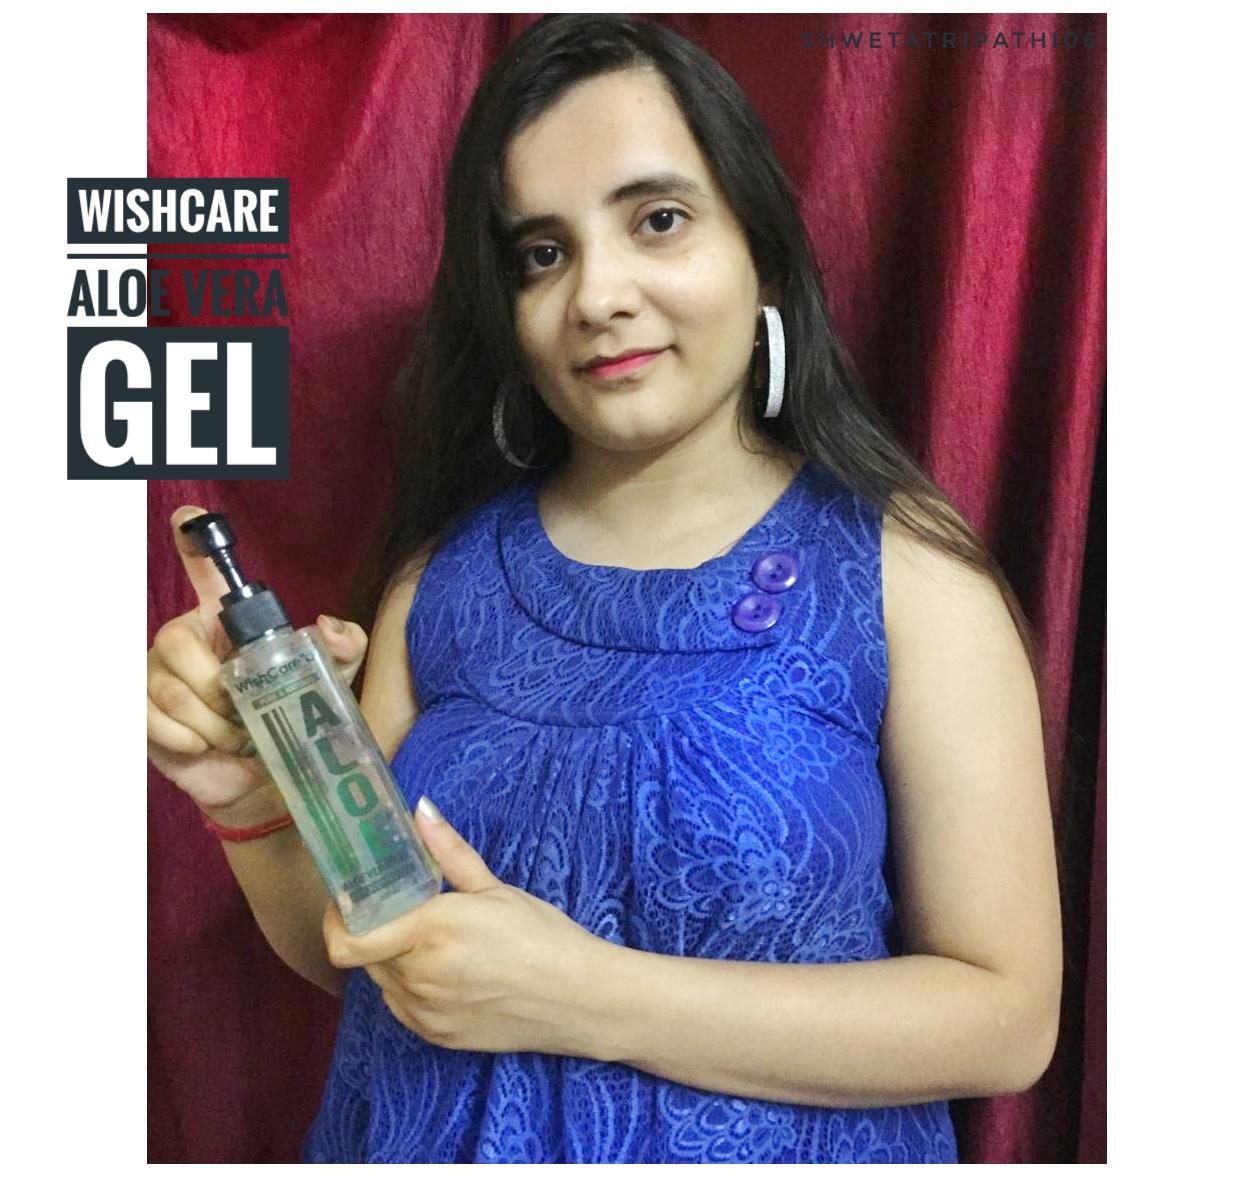 WishCare Pure & Natural Aloe Vera Gel -Aloe vera gel-By shwetatripathi0